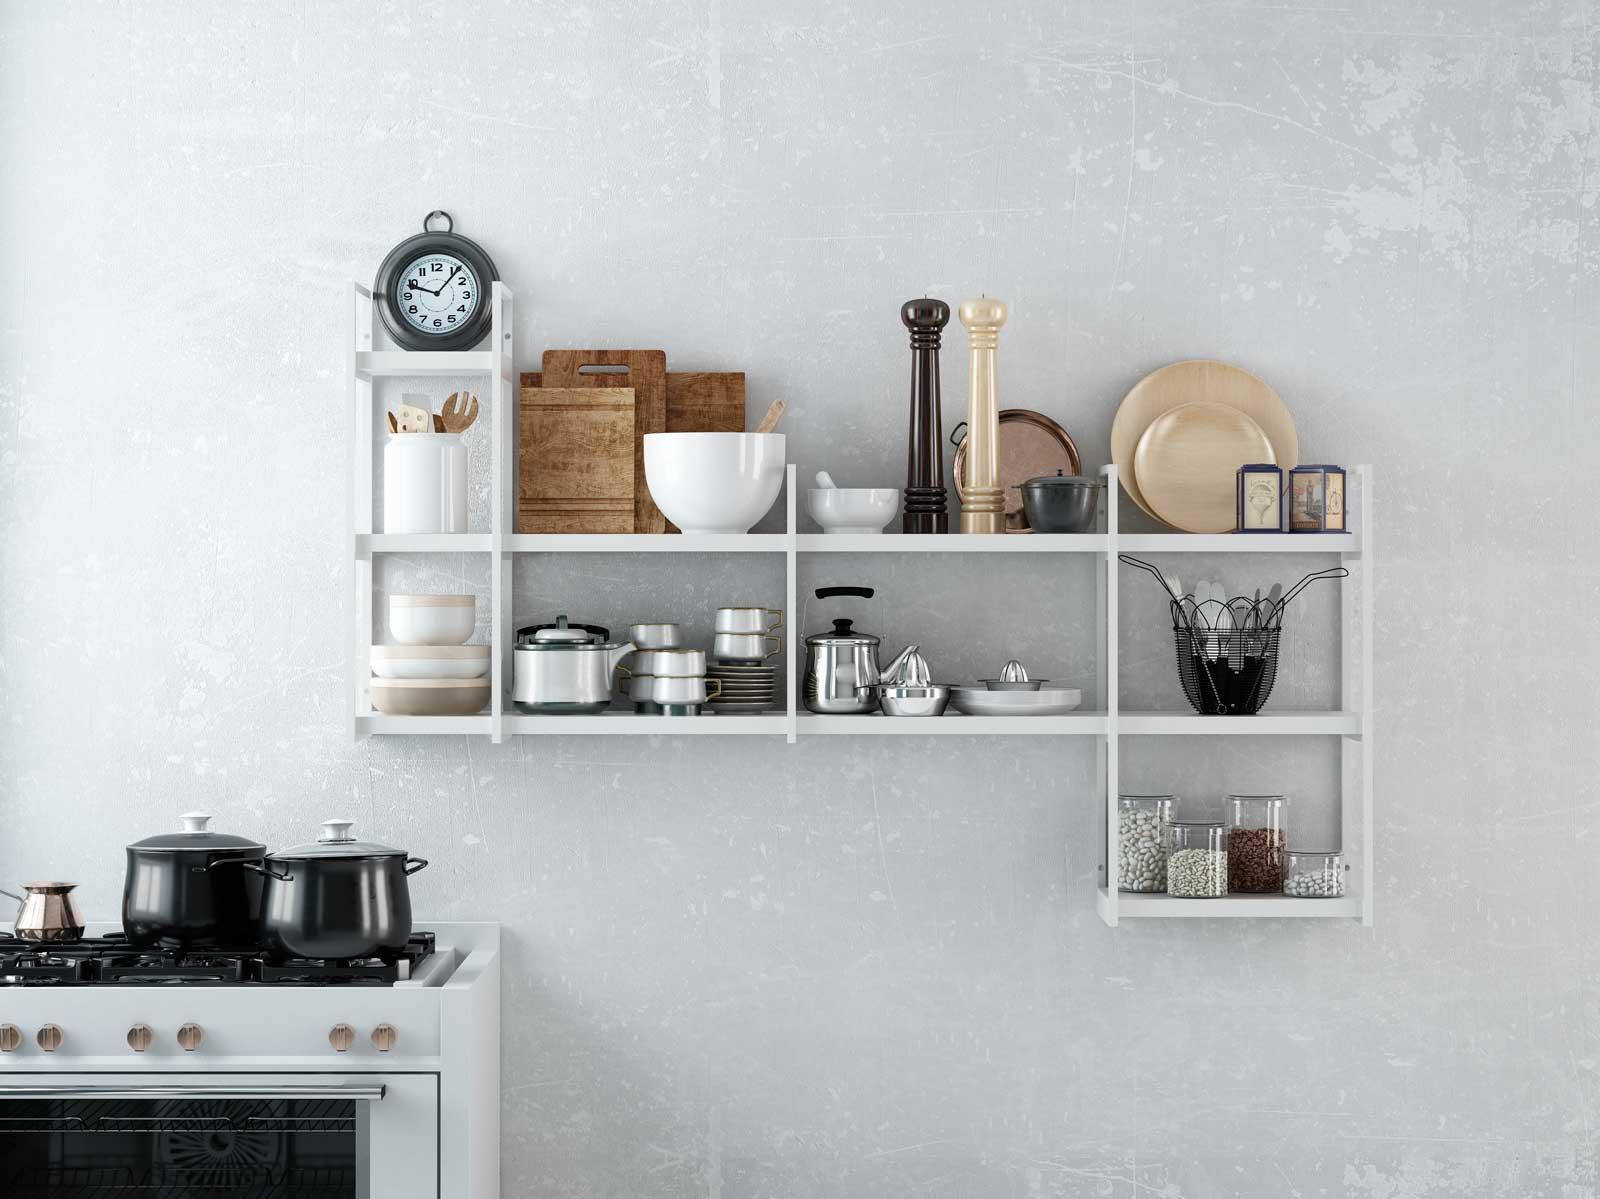 Ikea estanterias metalicas cocina for Estanterias pared cocina